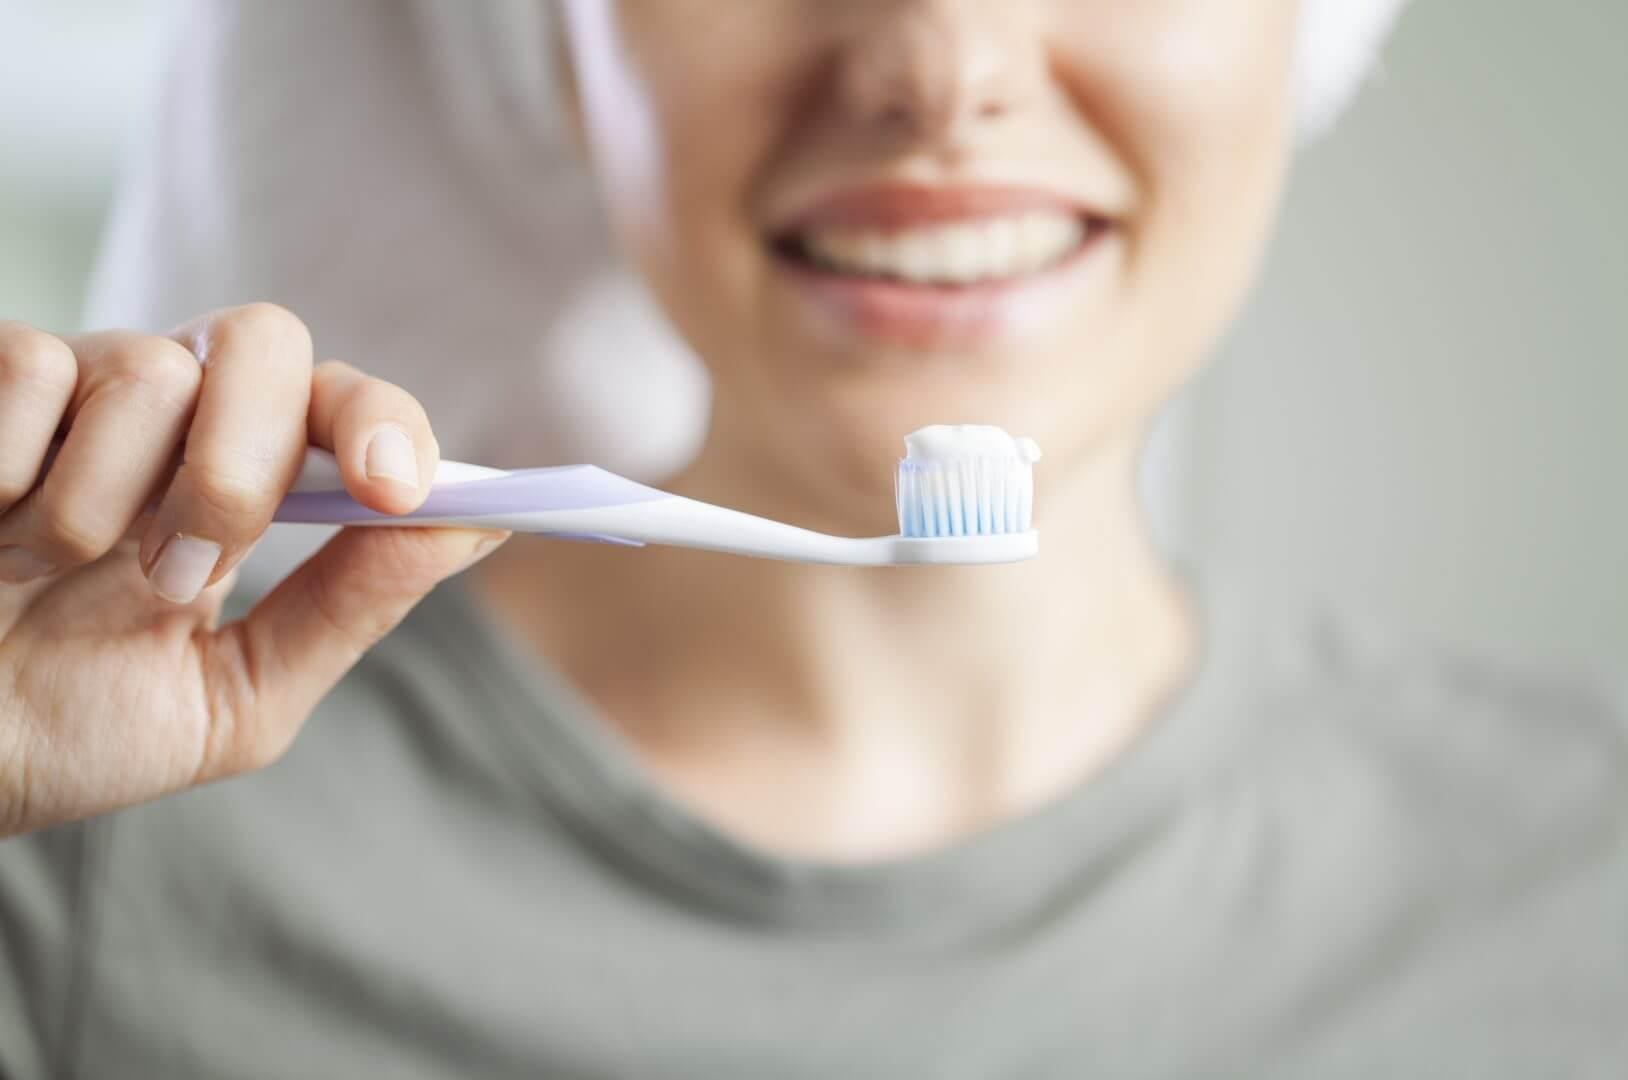 tandpasta mod bumser